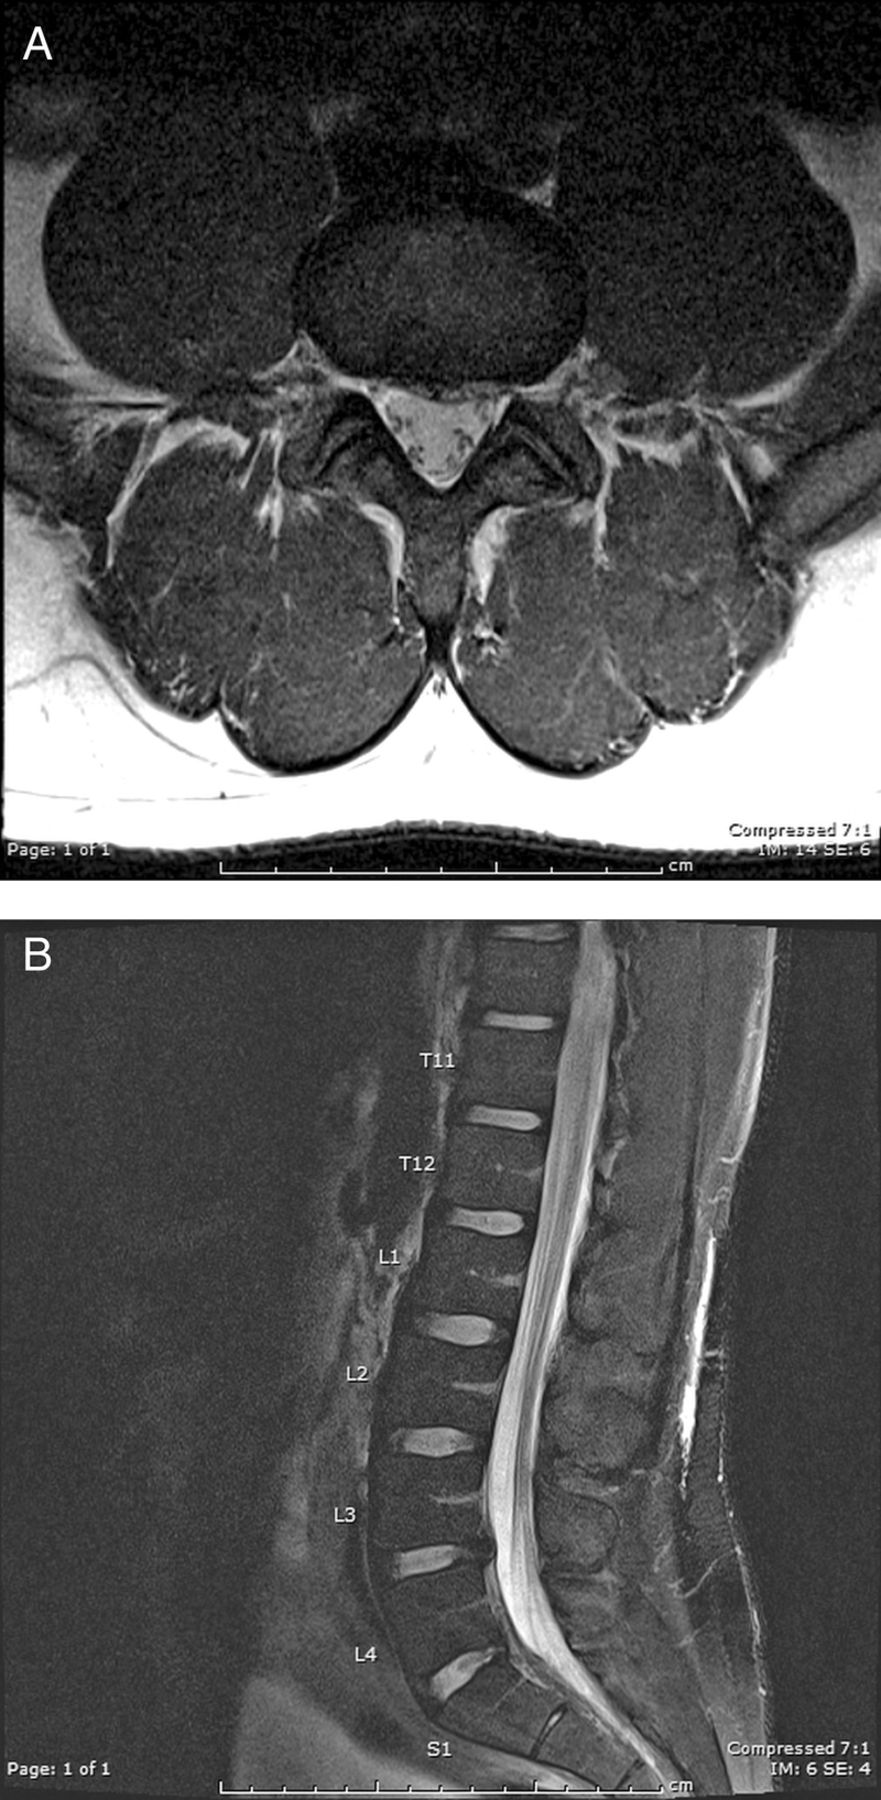 Spontaneous resolution of idiopathic lumbar subdural hygroma